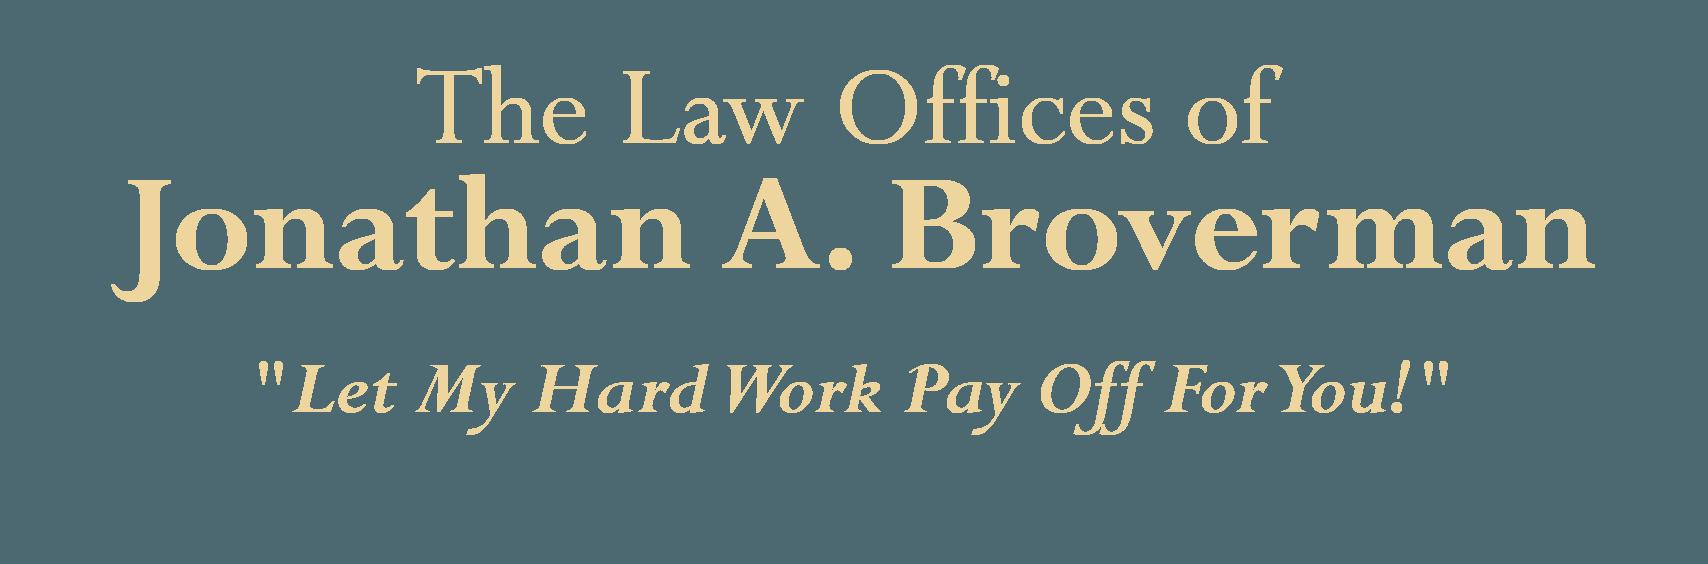 Attorney Jonathan A. Broverman - logo